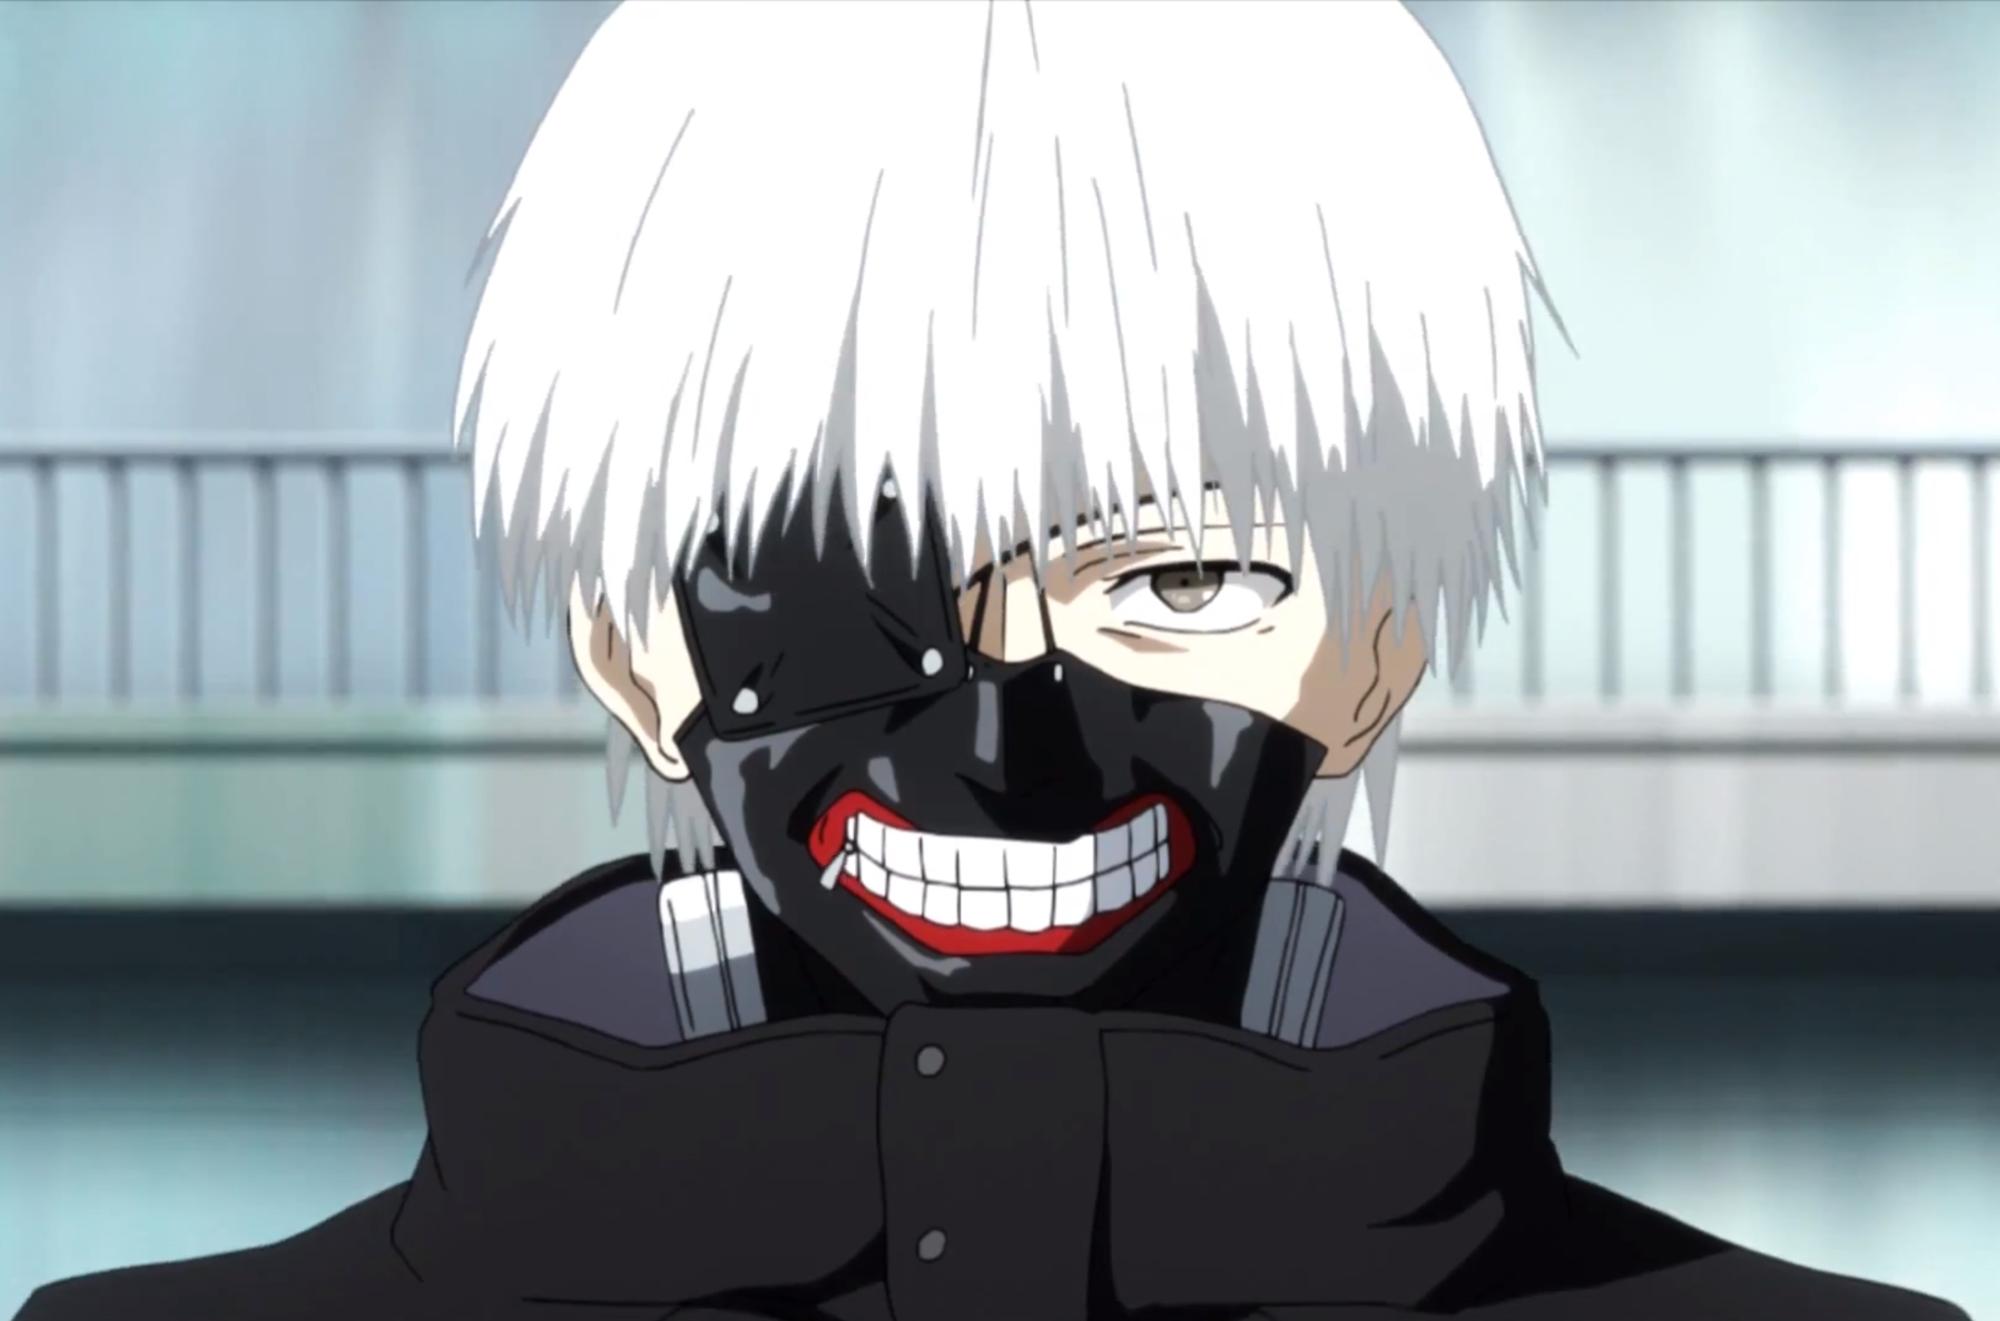 Half-ghoul Ken as he appears in the anime